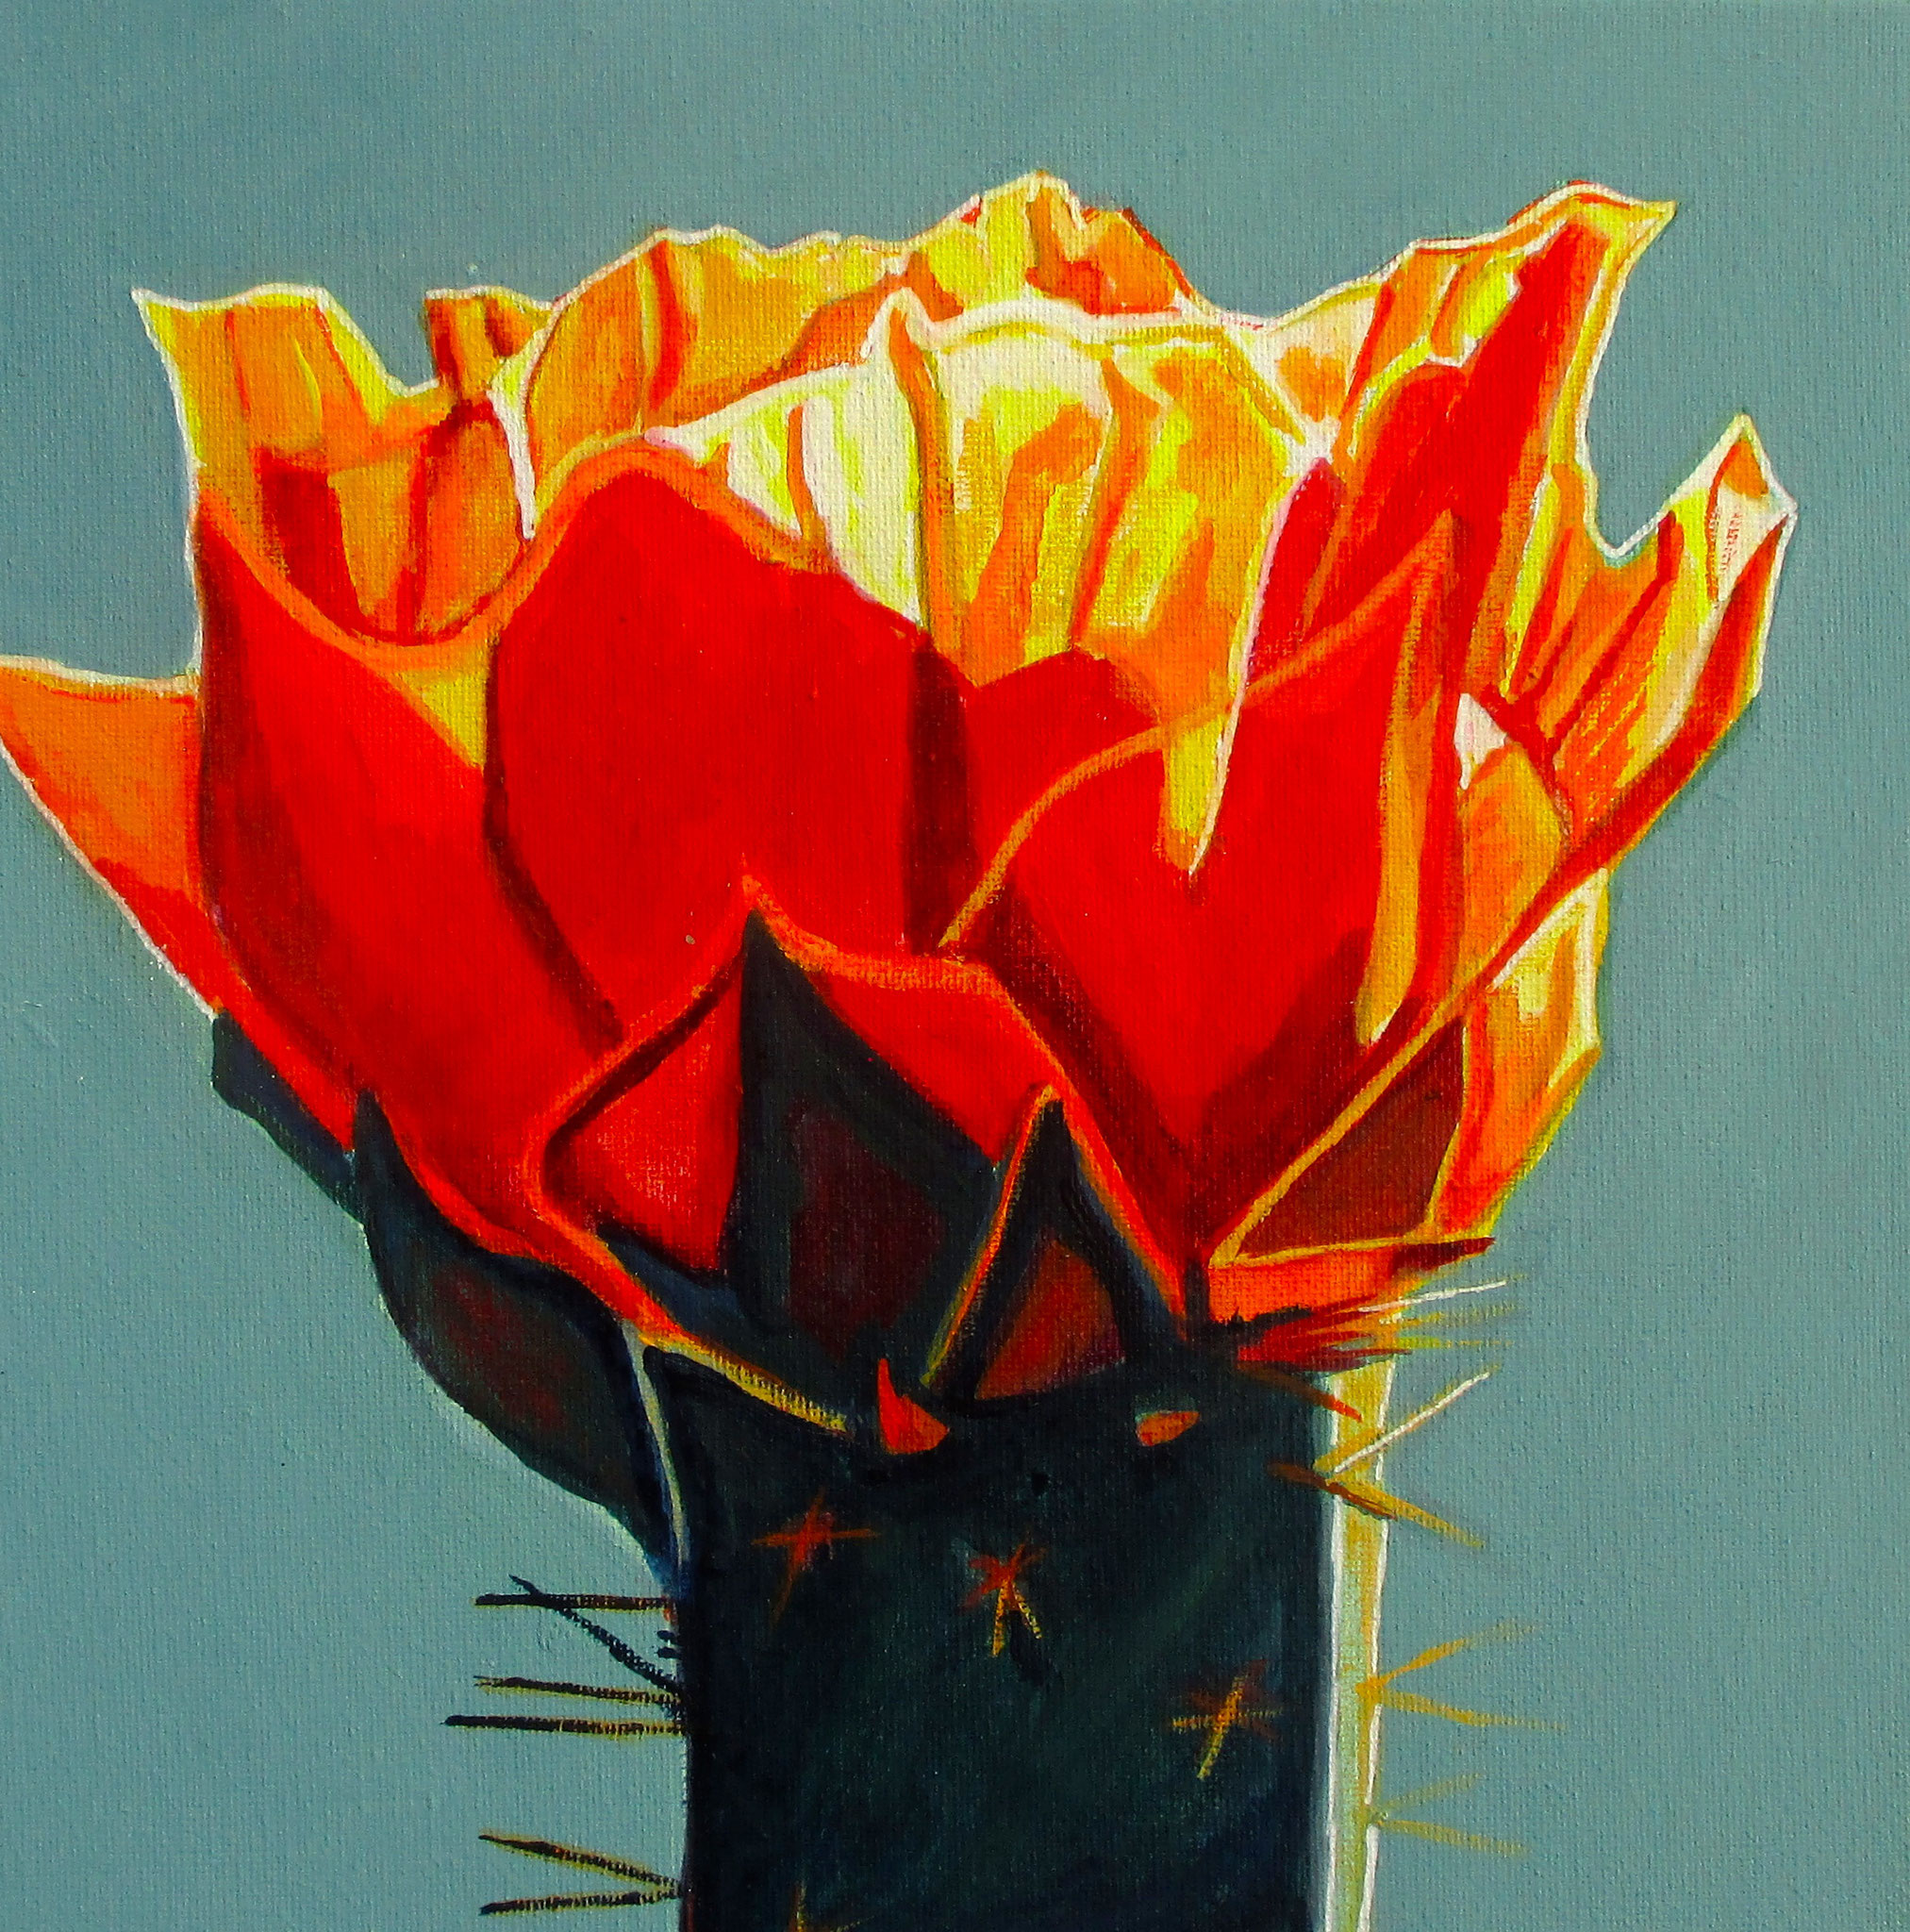 Firecracker Blossom, acrylic on canvas, 10 x 10, 2018 SOLD